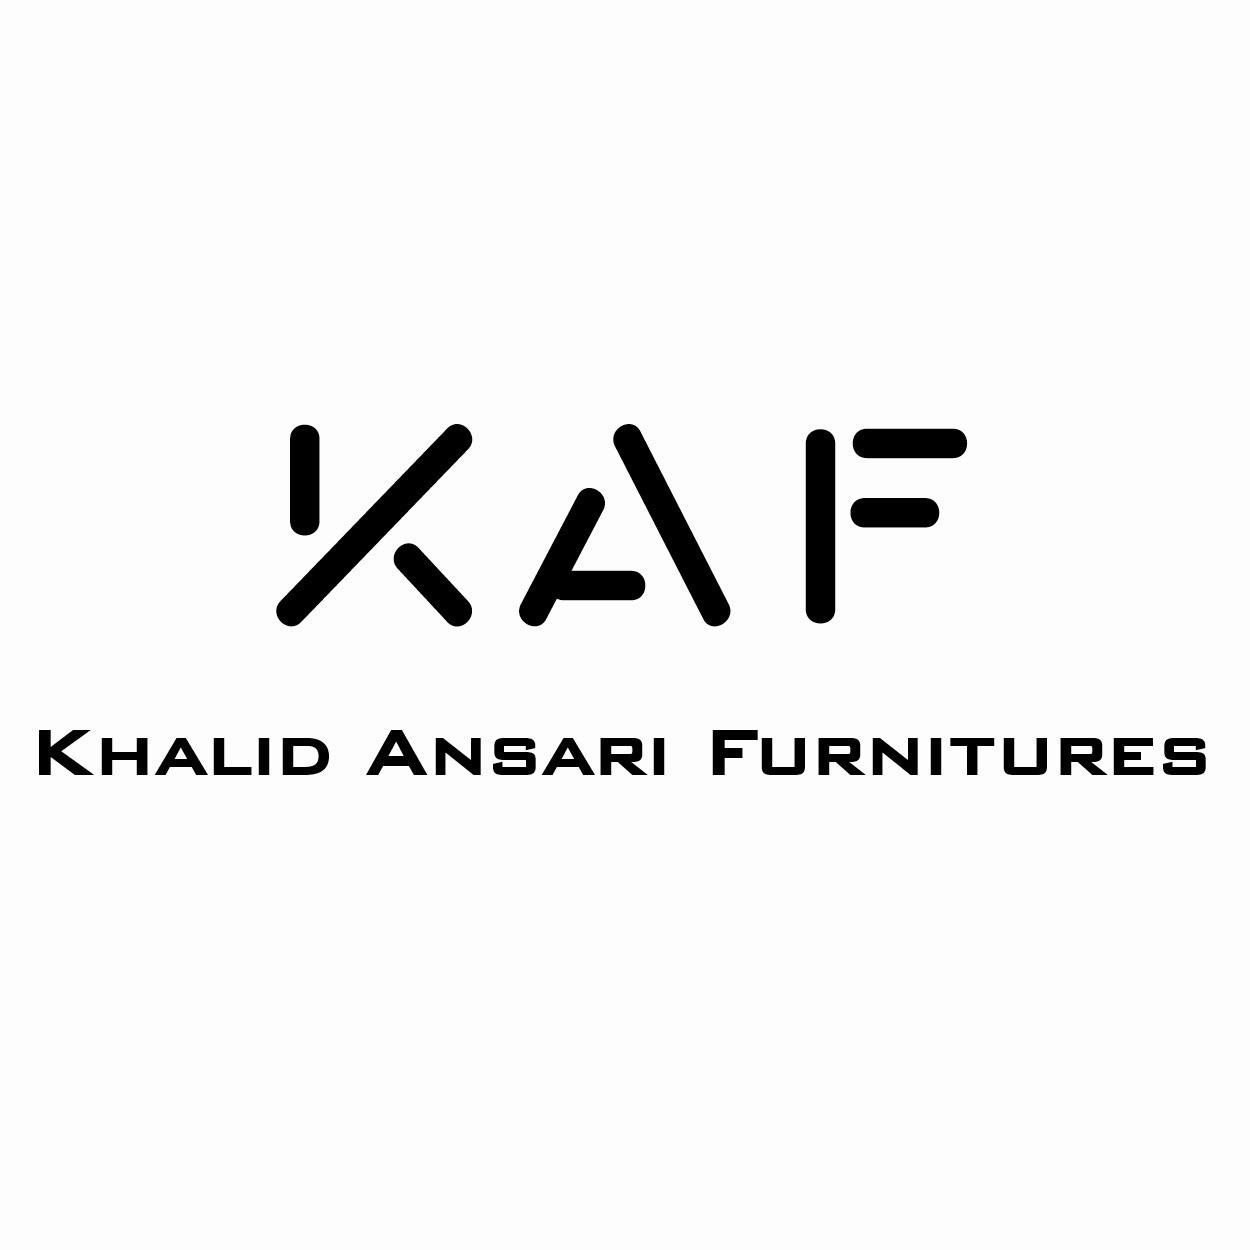 Khalid Ansari Furnitures (Lahore)